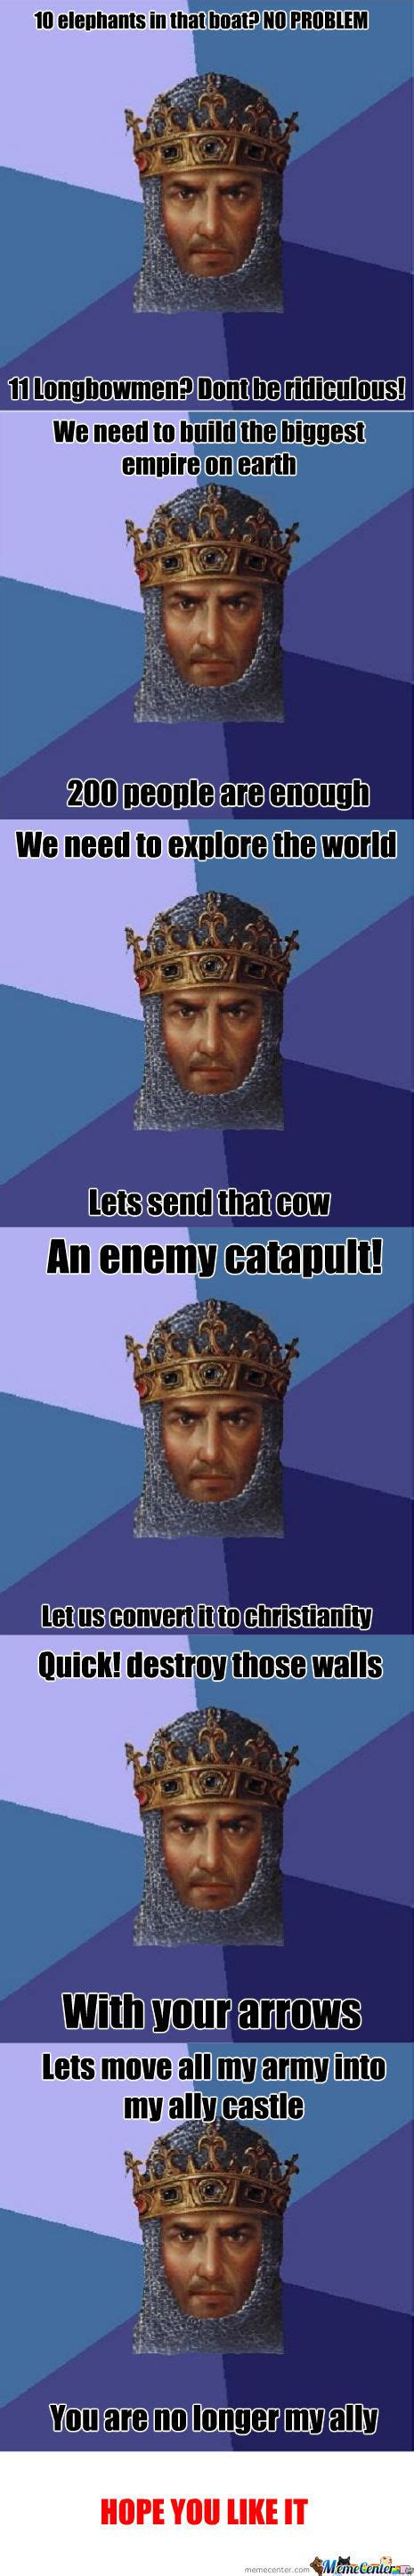 Age Of Empire Meme - age of empires meme recopilation by francisco9622 meme center